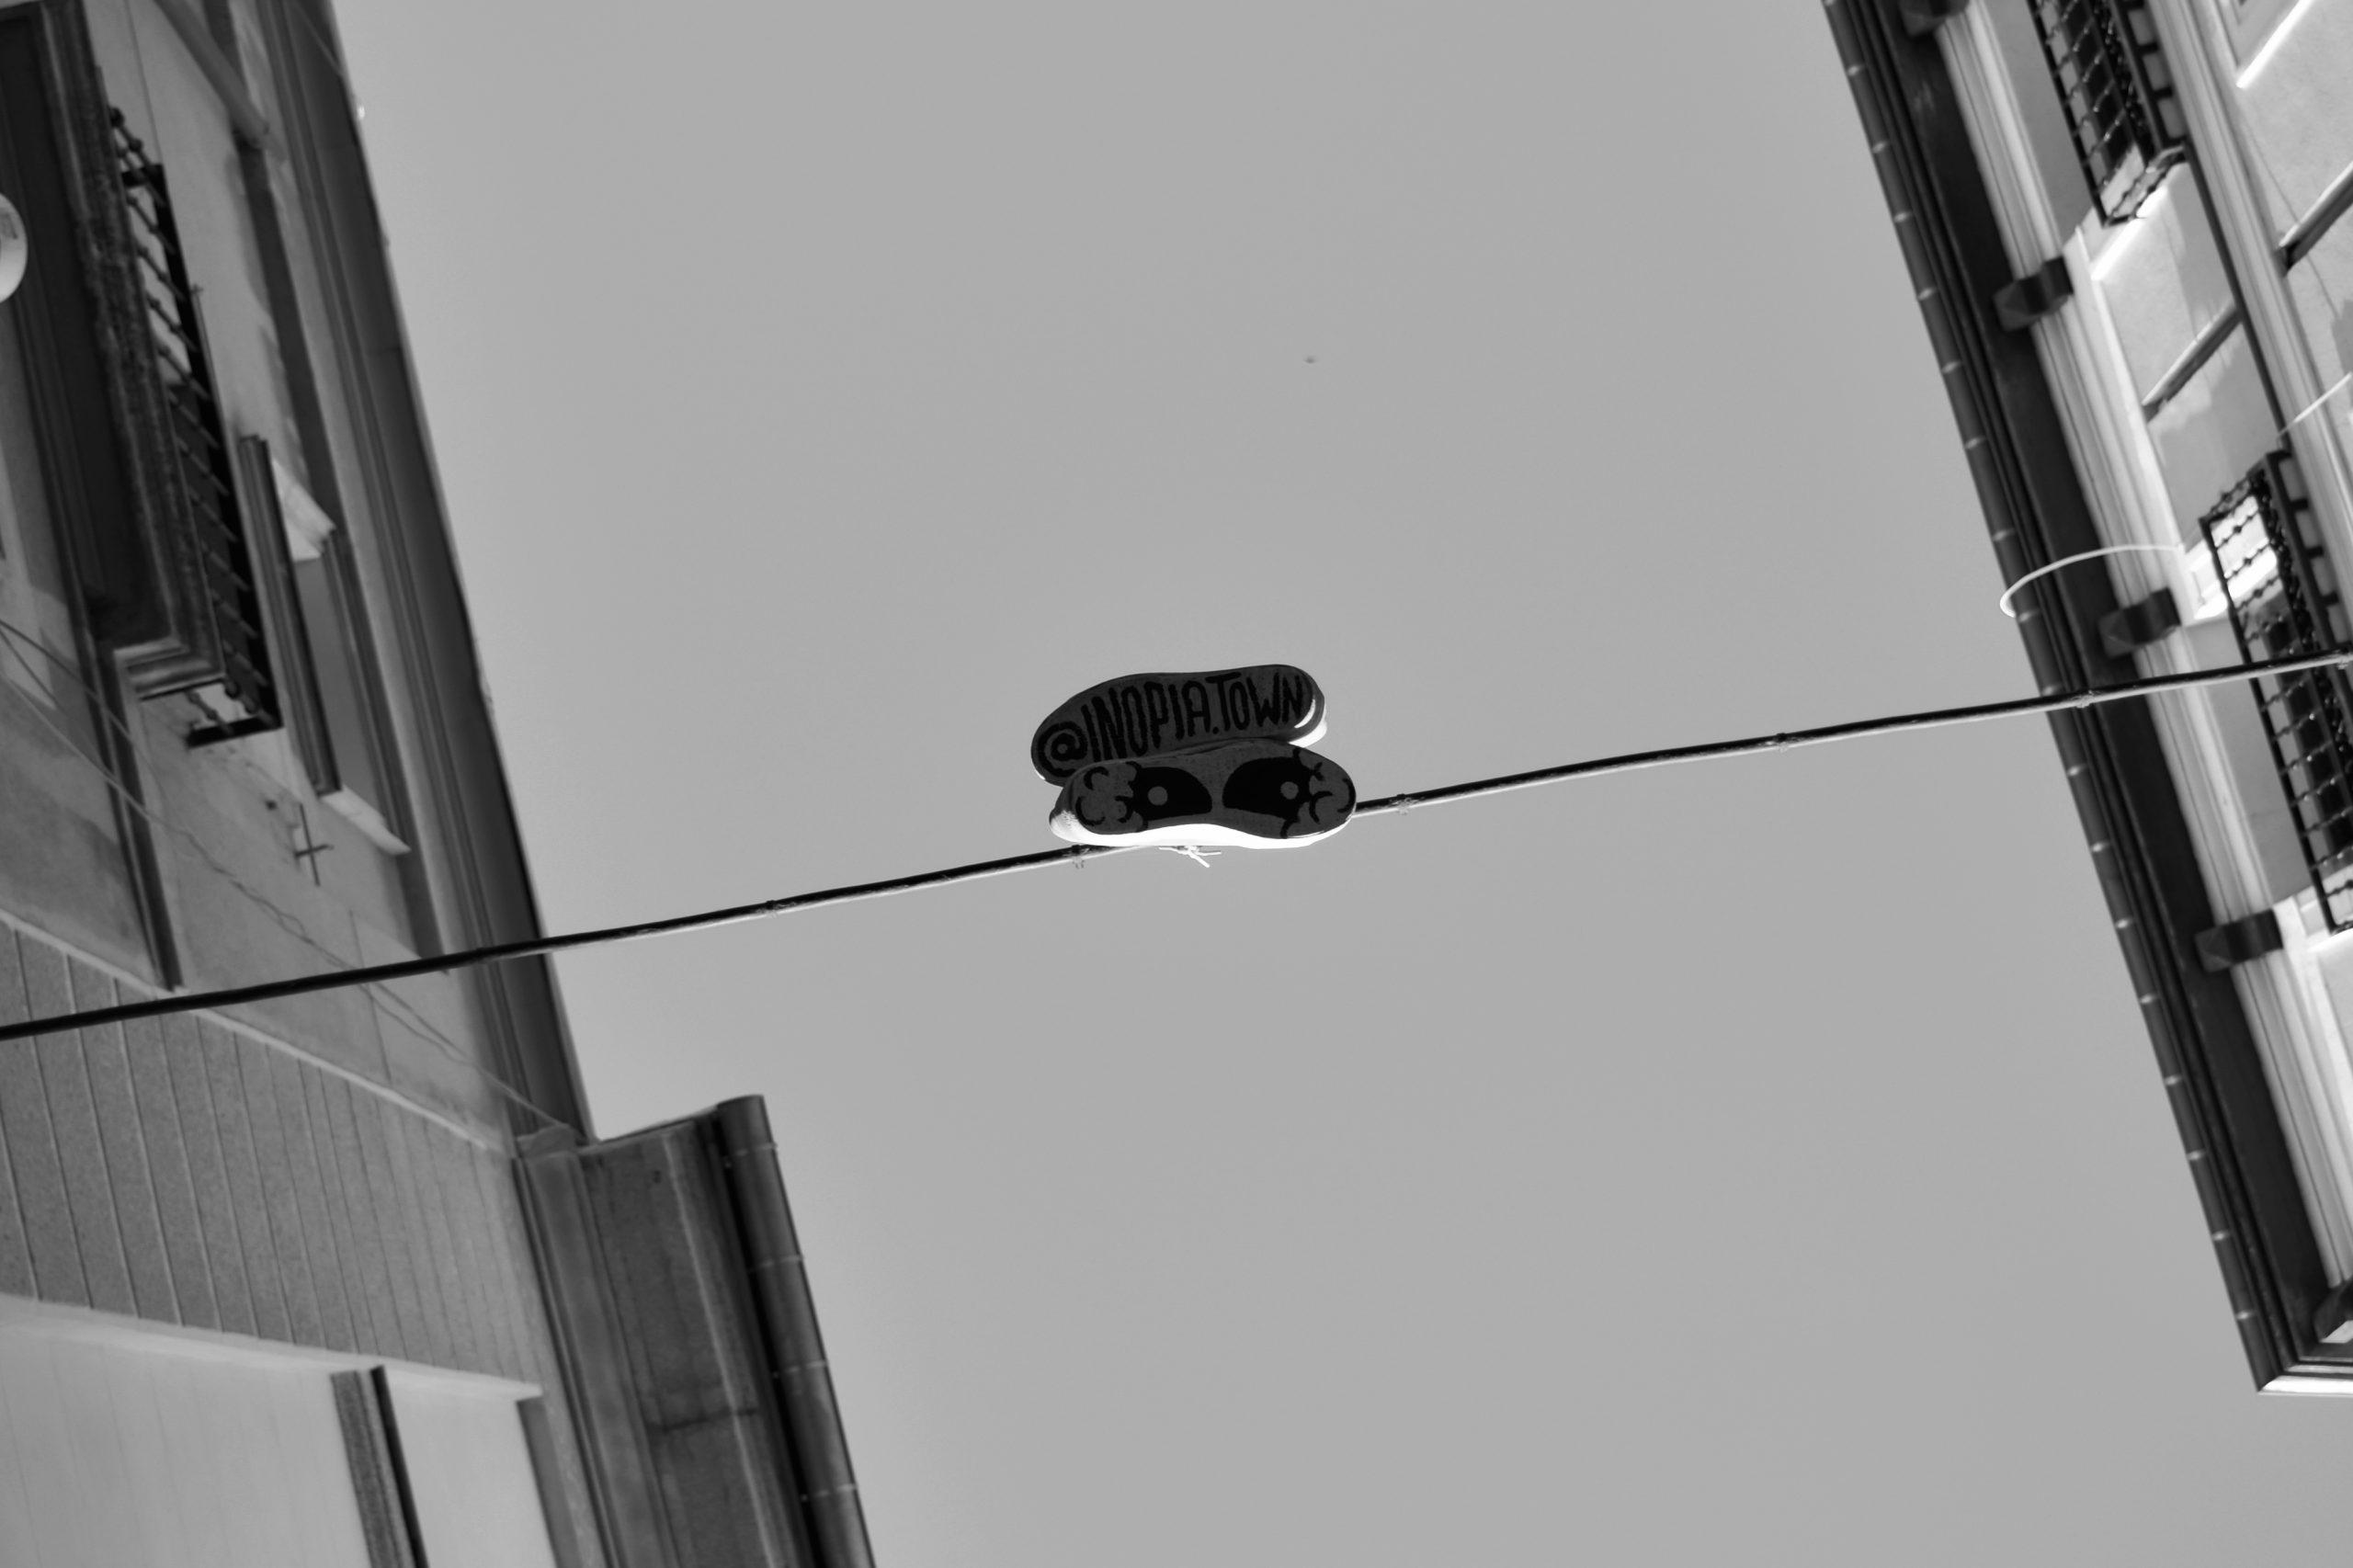 Inopia nizorra cable byn